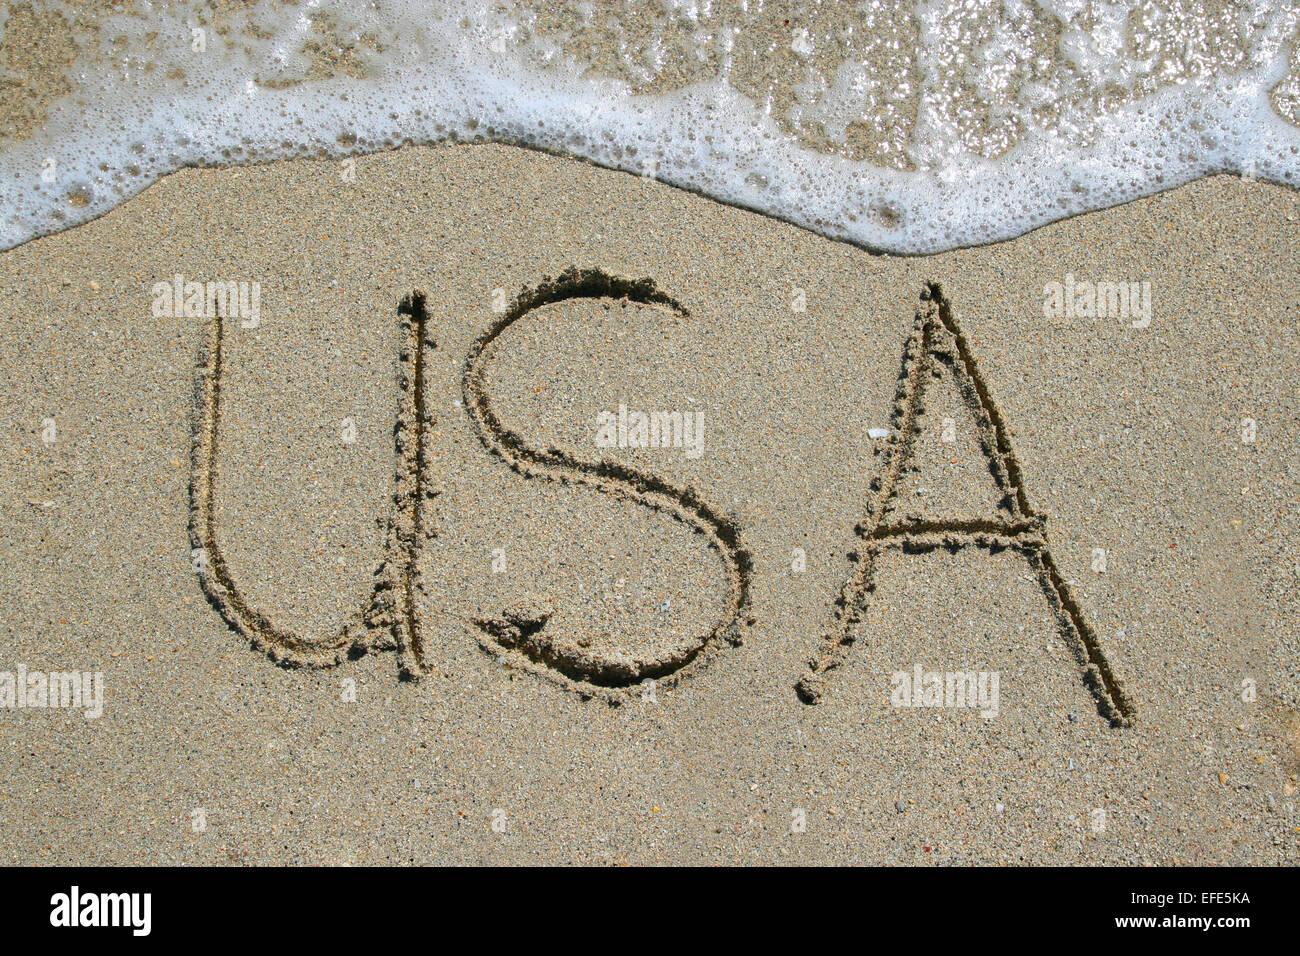 Strand USA - Stock Image